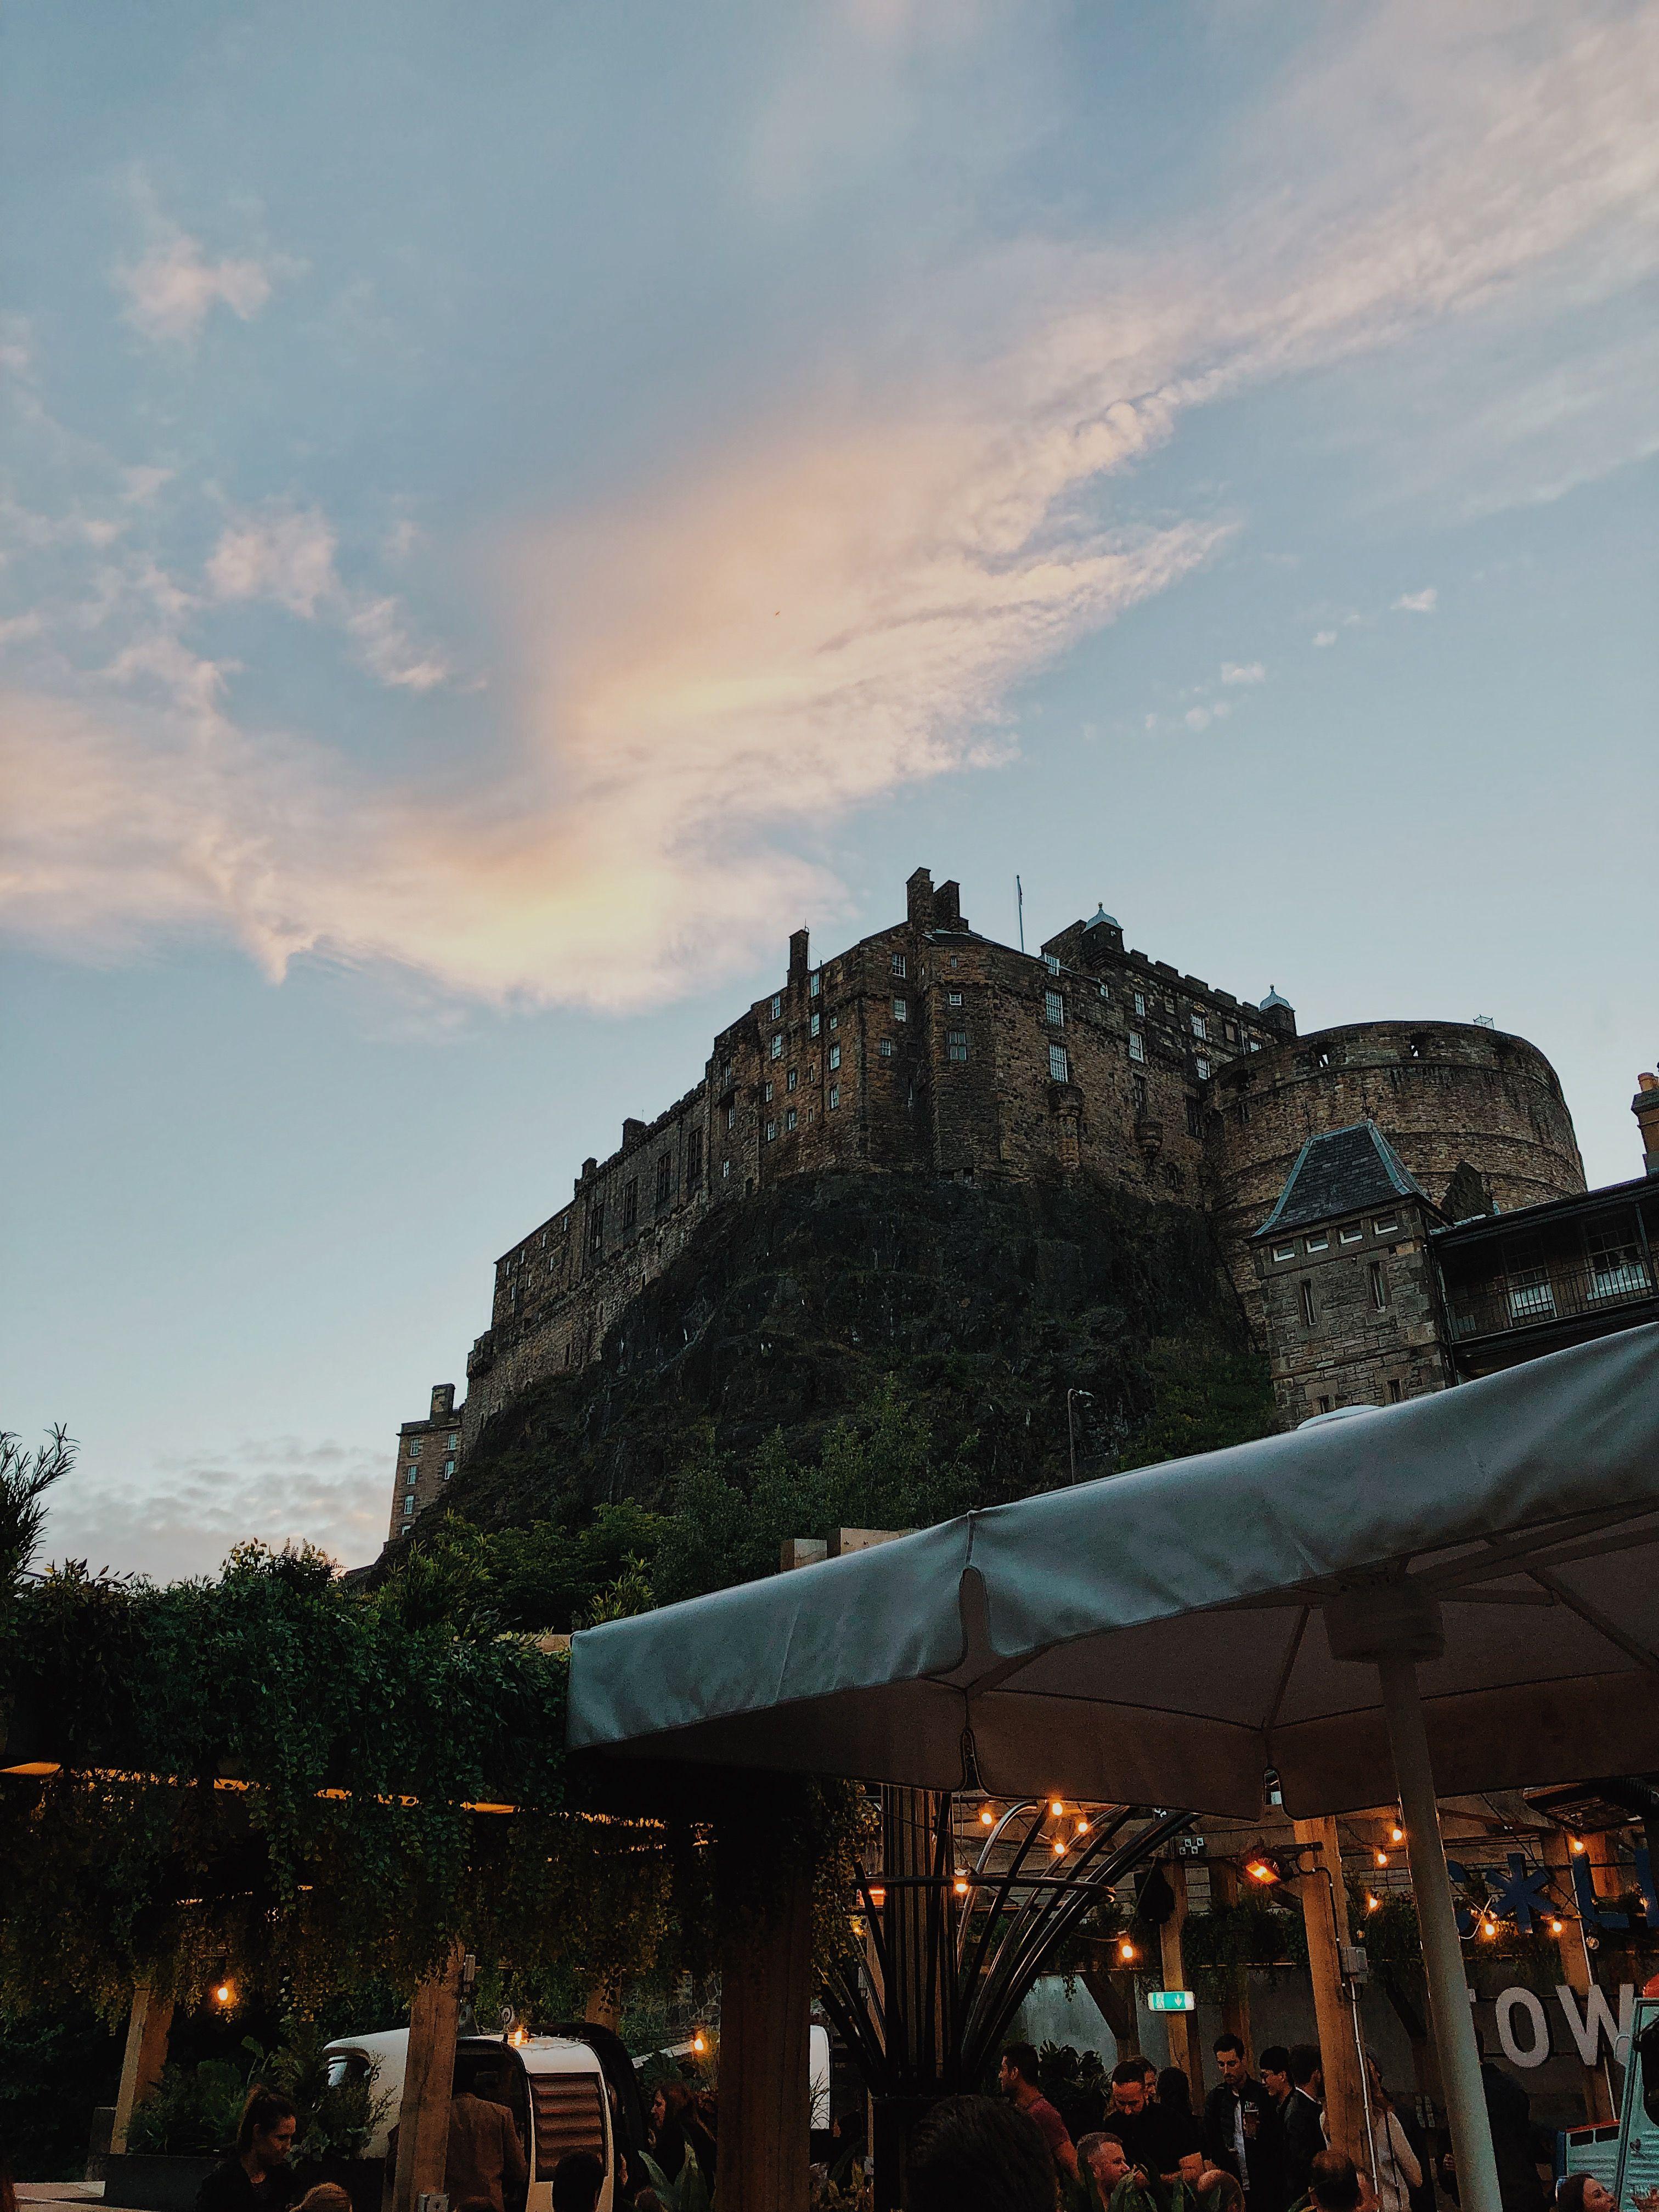 A selection of photos spots in Edinburgh city centre #edinburgh #thisisedinburgh #visitedinburgh #edinburghphotography #edinburghcity #edinburghtravel #scotland #thisisscotland #visitscotland #scotlandphotography #travelguide #travelblog #travelwriter